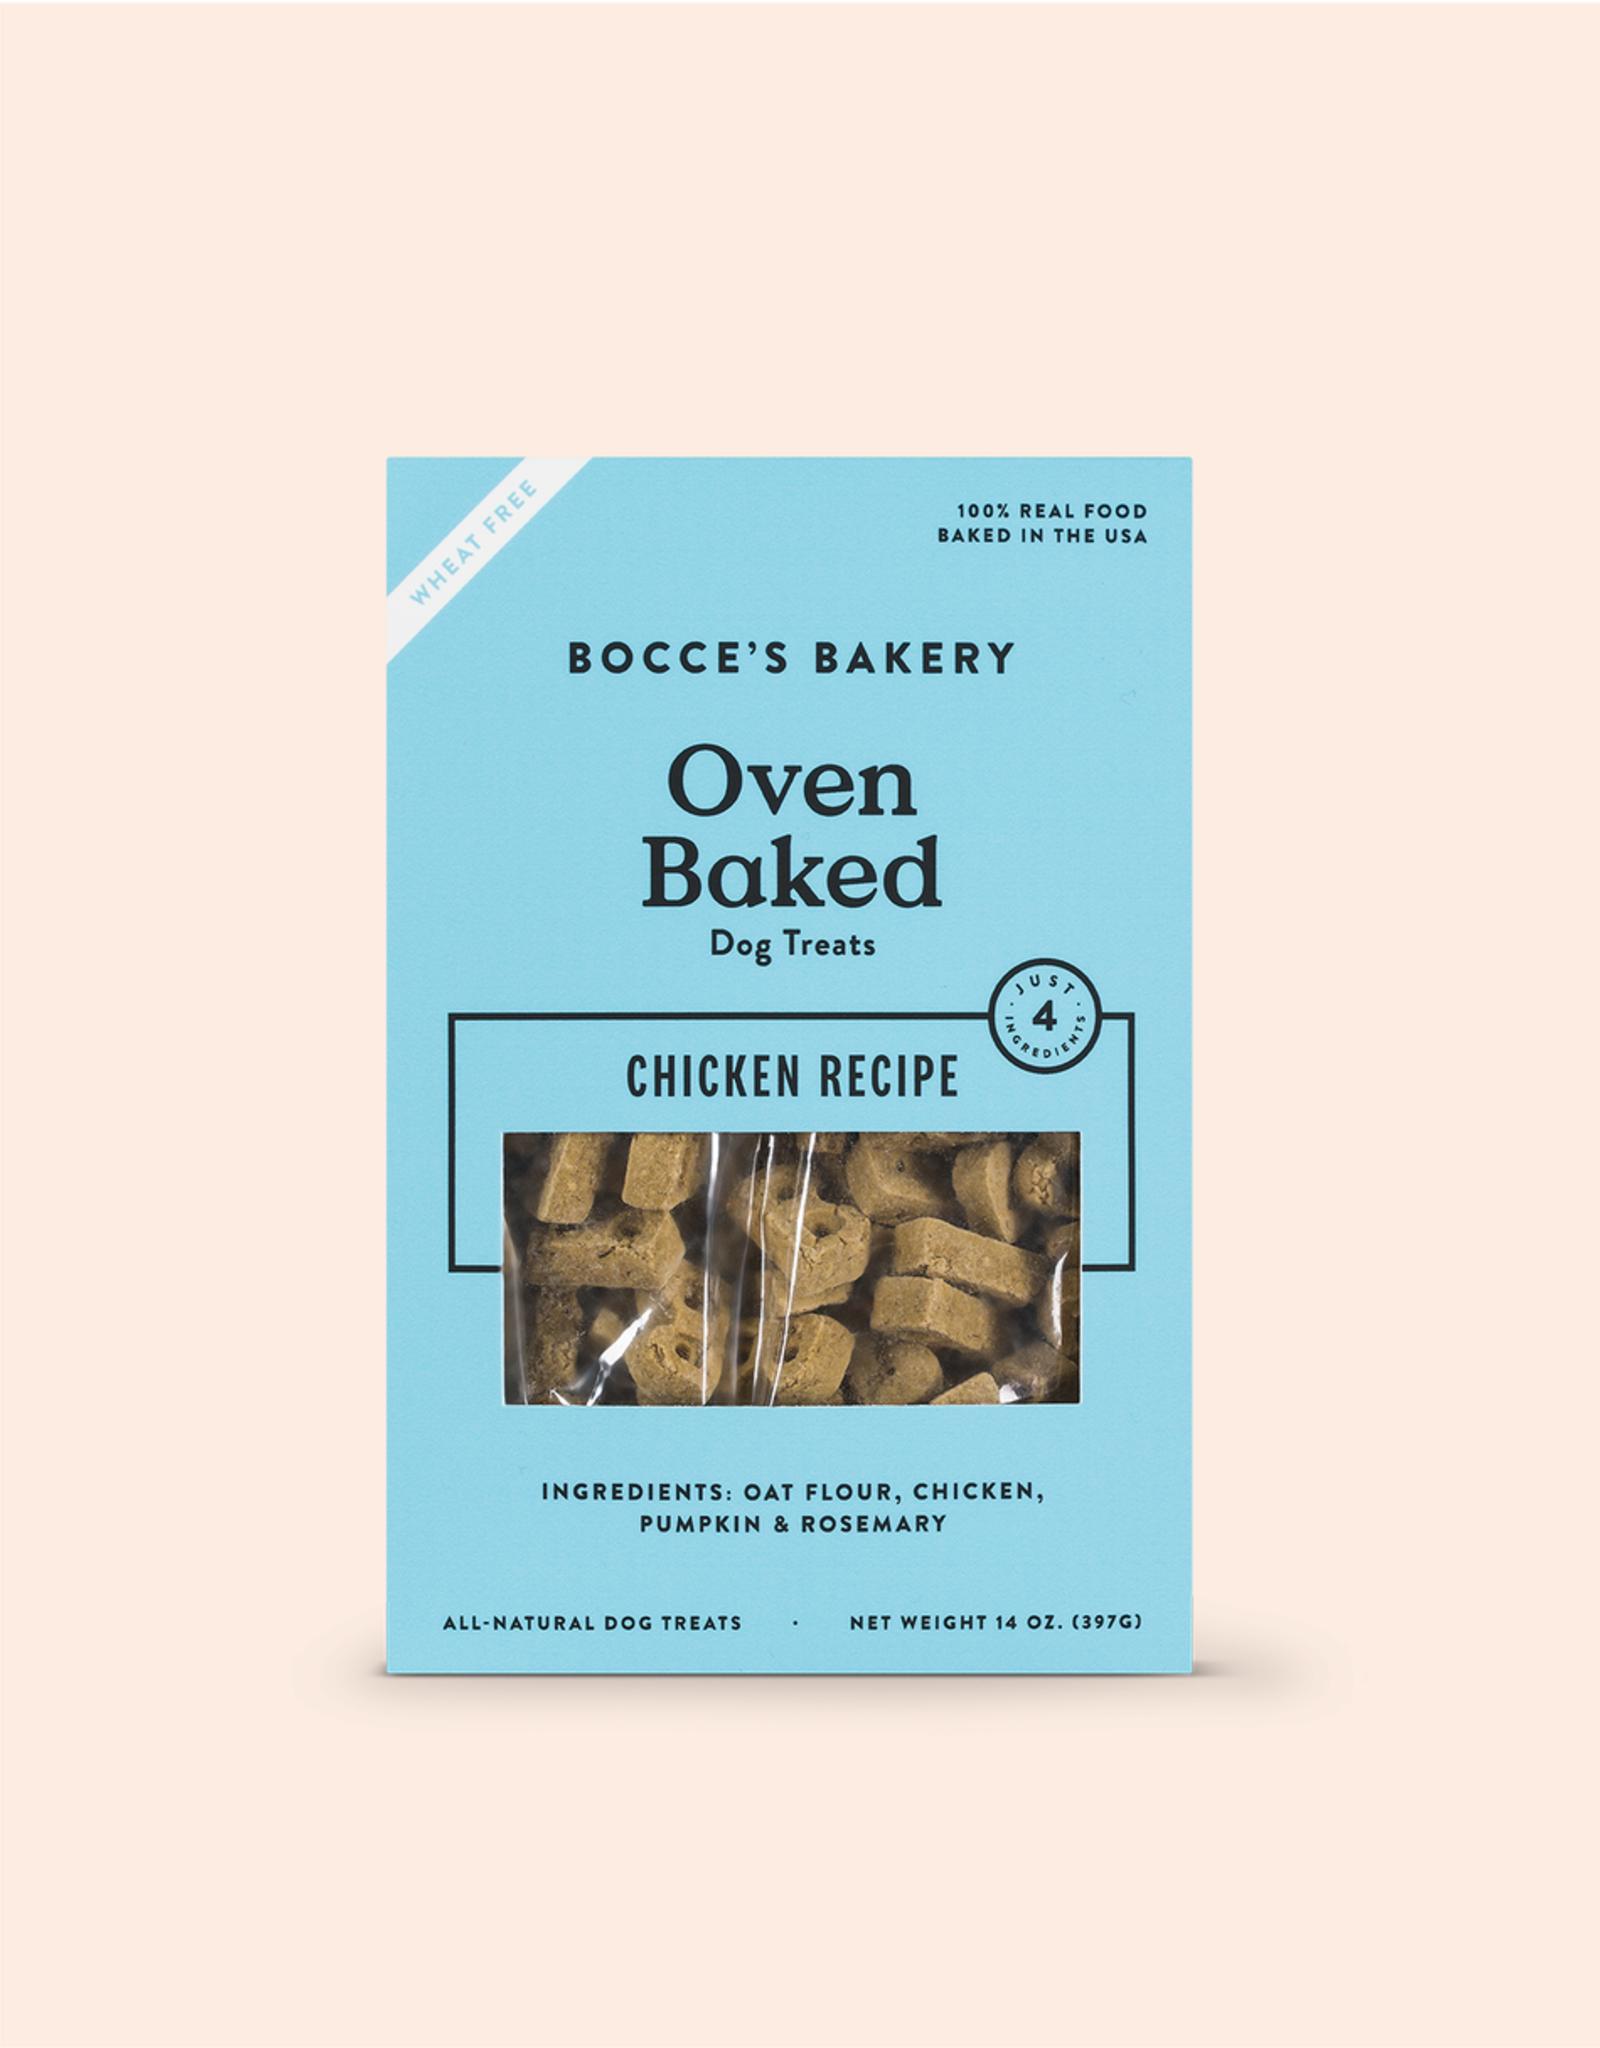 Bocce's Bakery Chicken